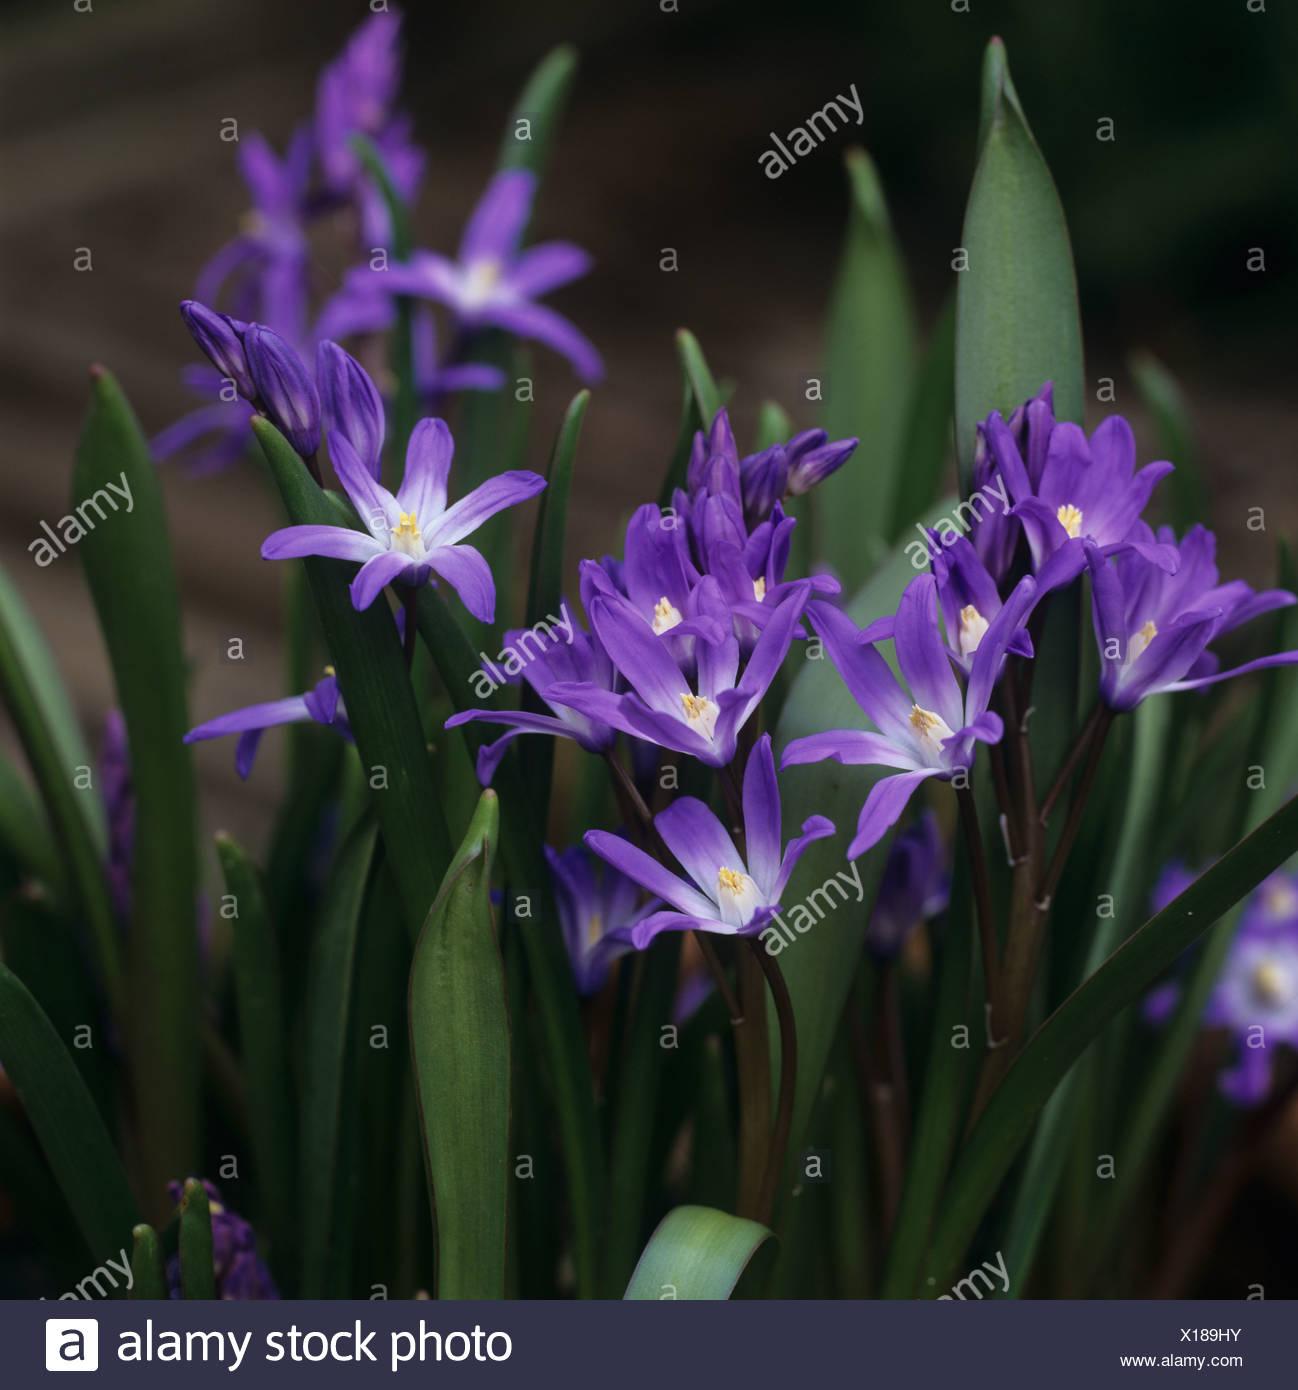 Chionodoxa forbesii Glory of the Snow flowering plants - Stock Image